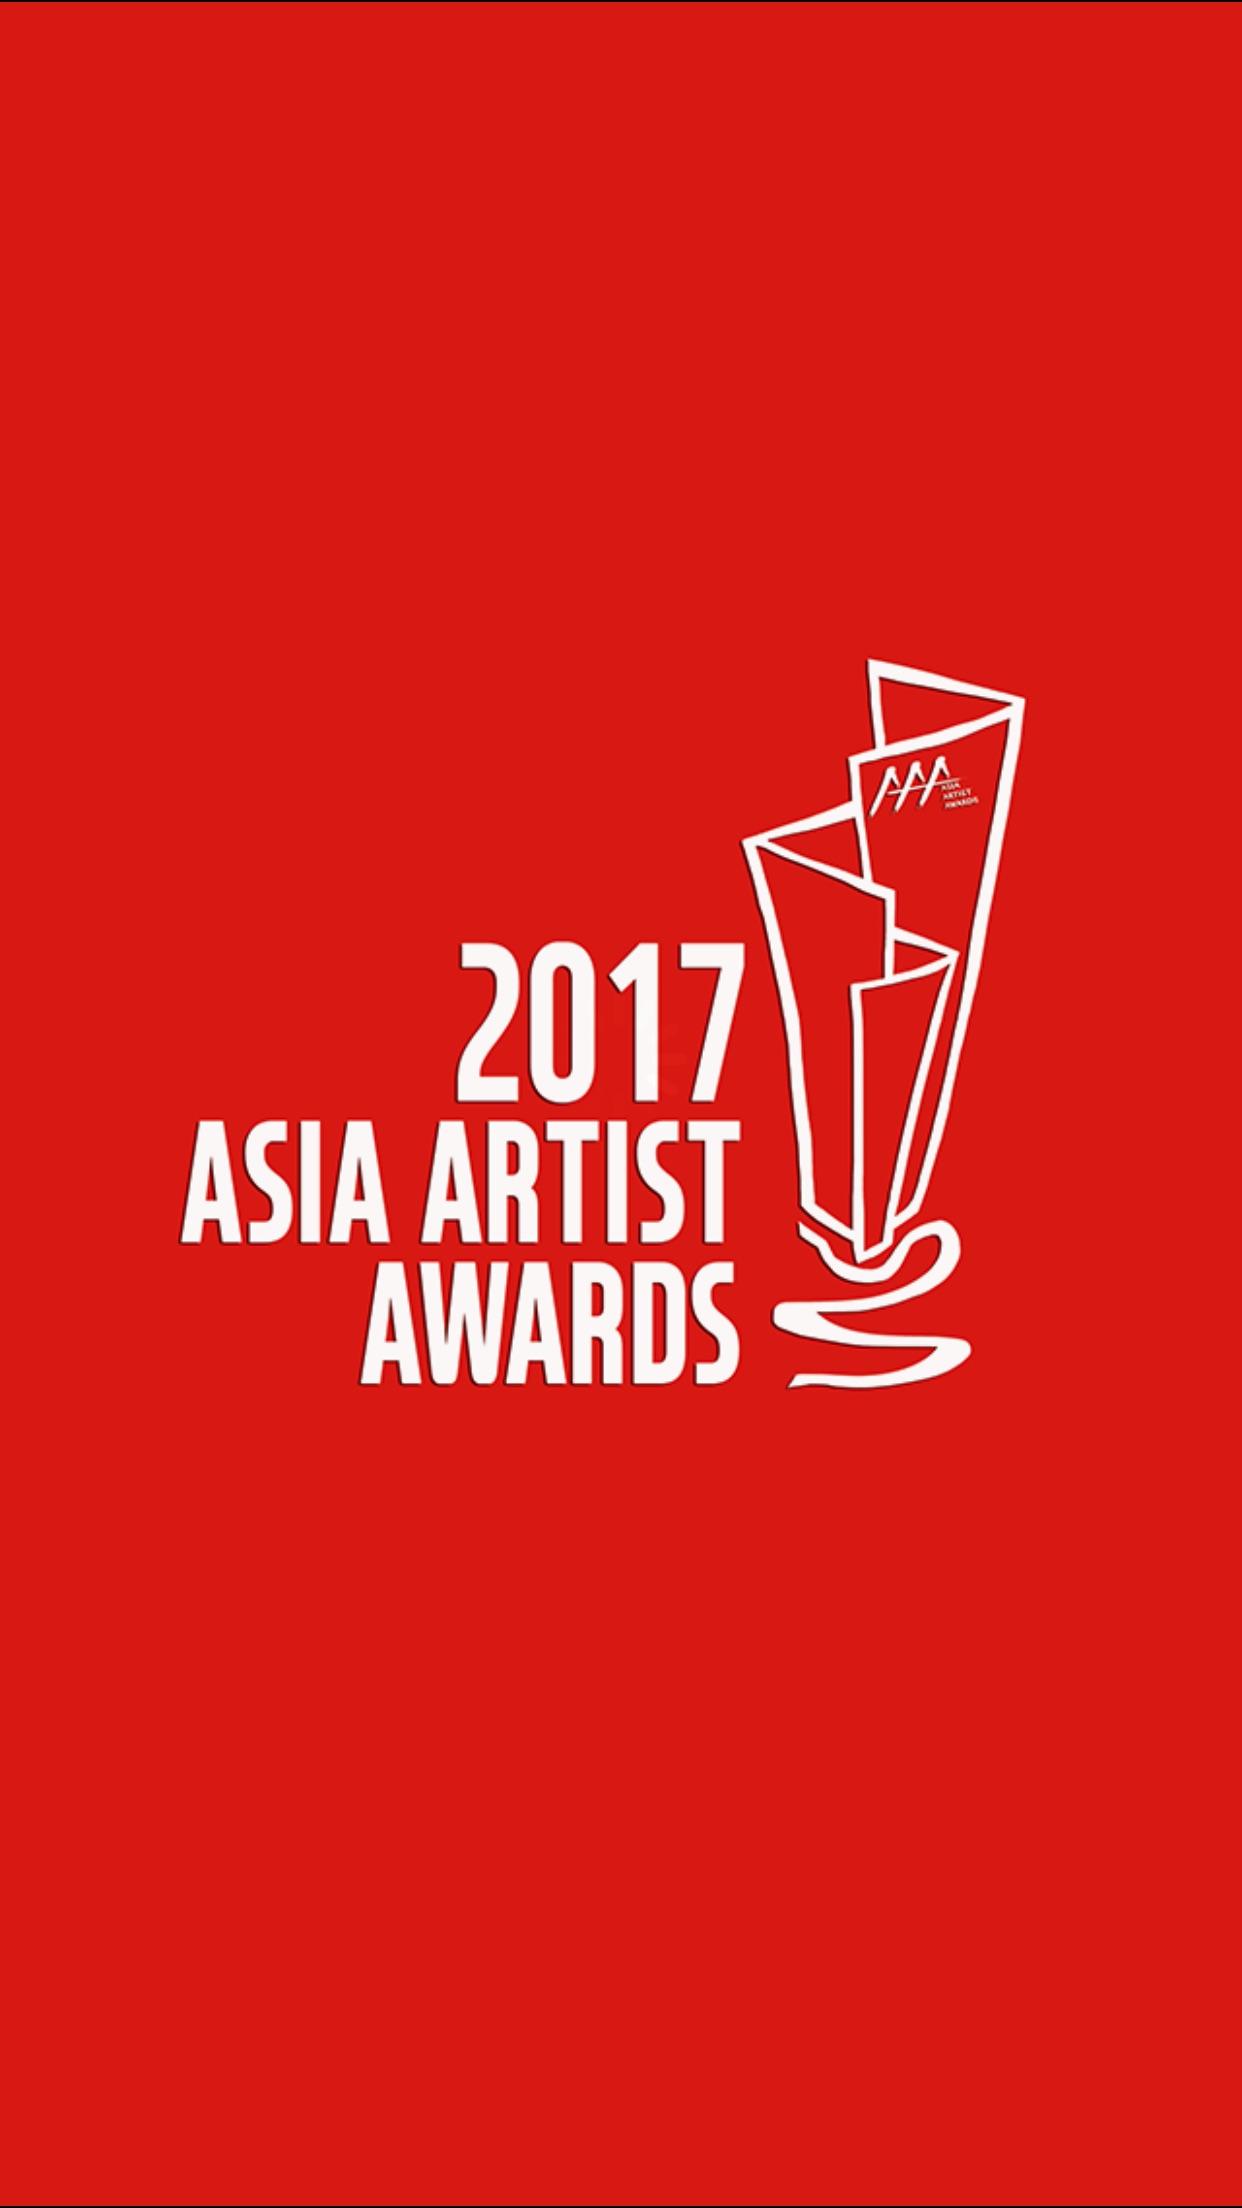 AAA - 2017 Asia Artist Awards Screenshot